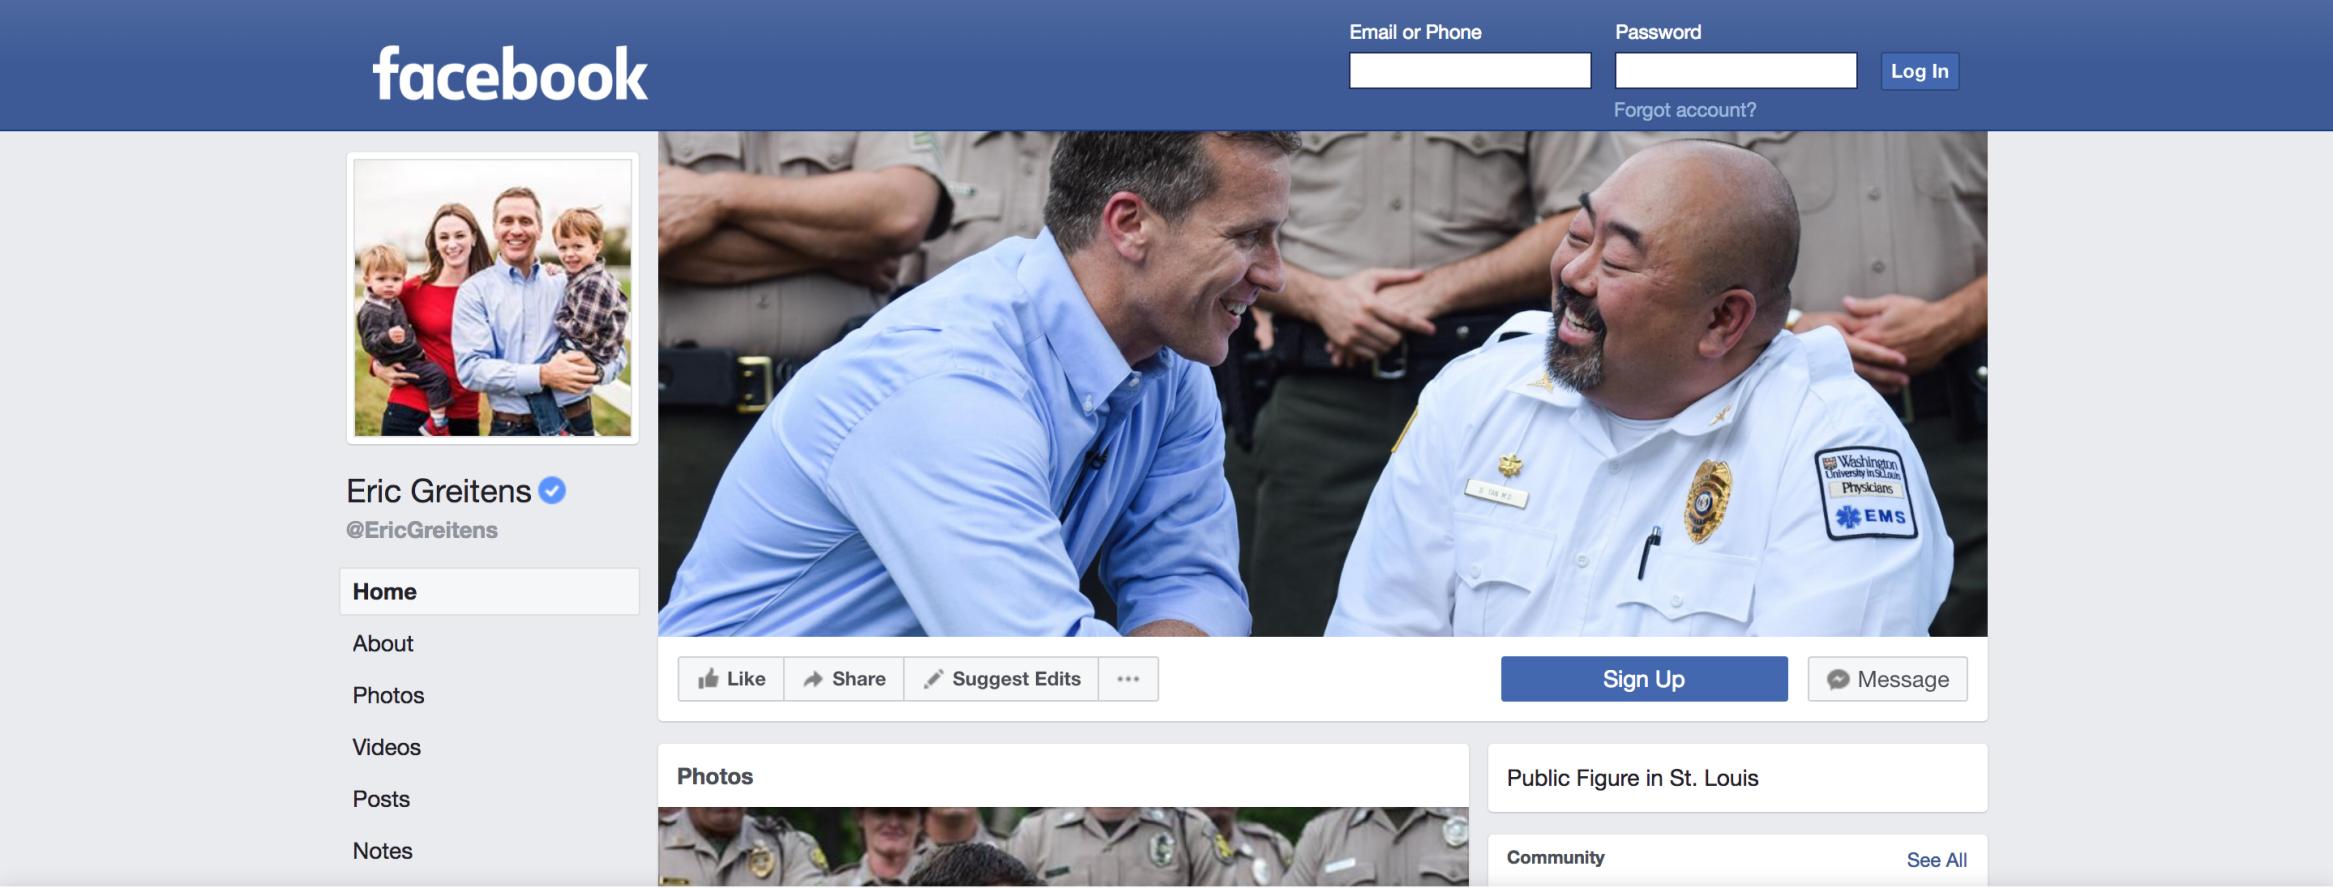 Gov. Eric Greitens' Facebook page